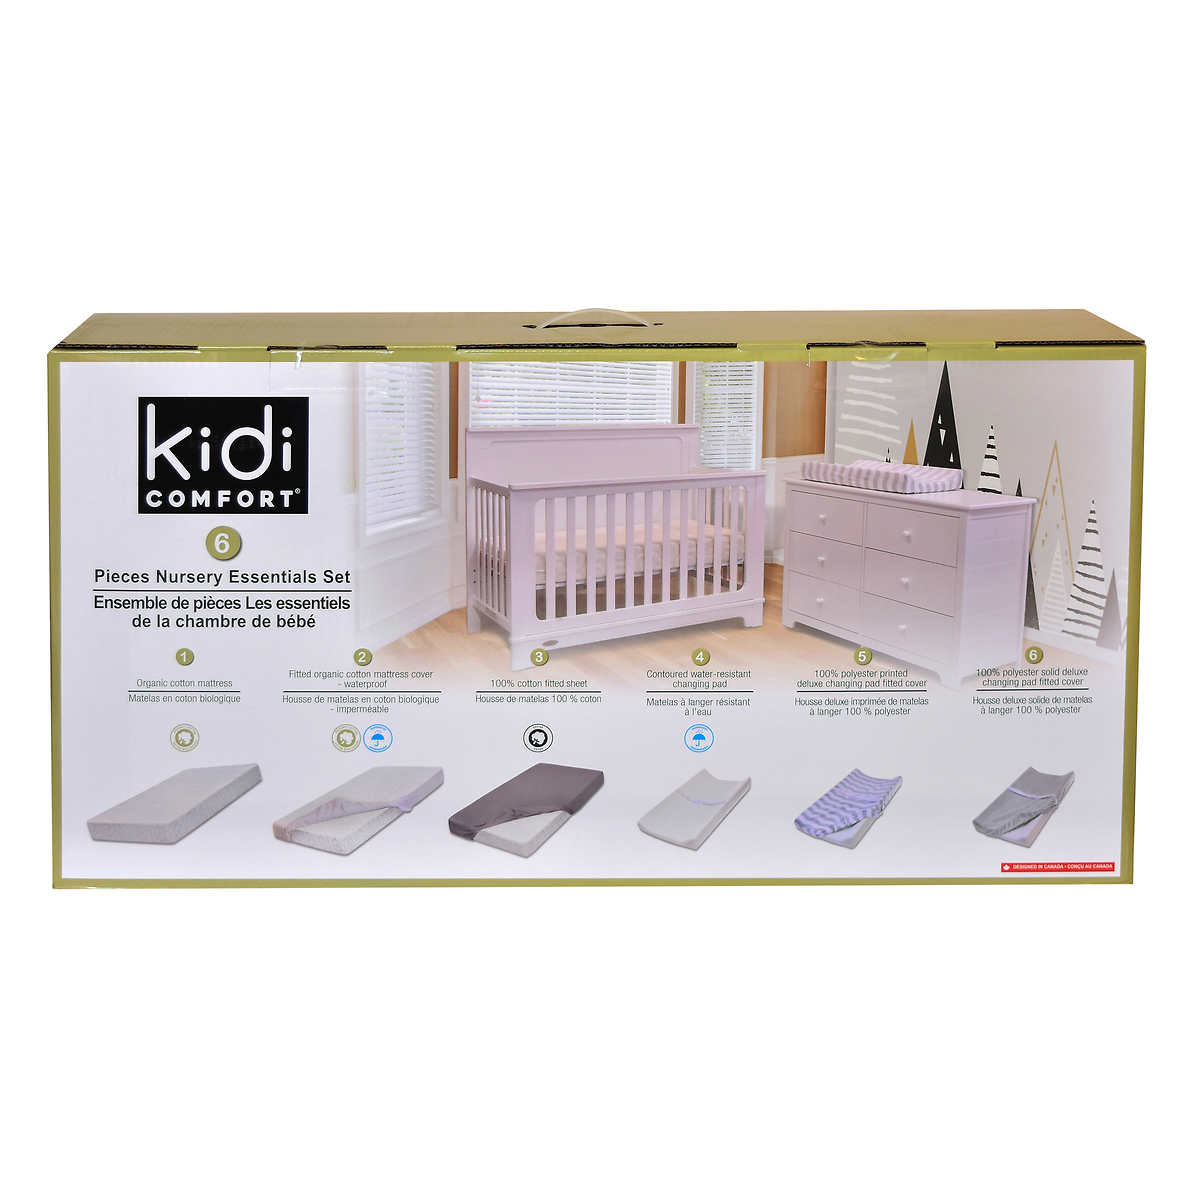 Kidicomfort Nursery Essentials 6 Piece Set